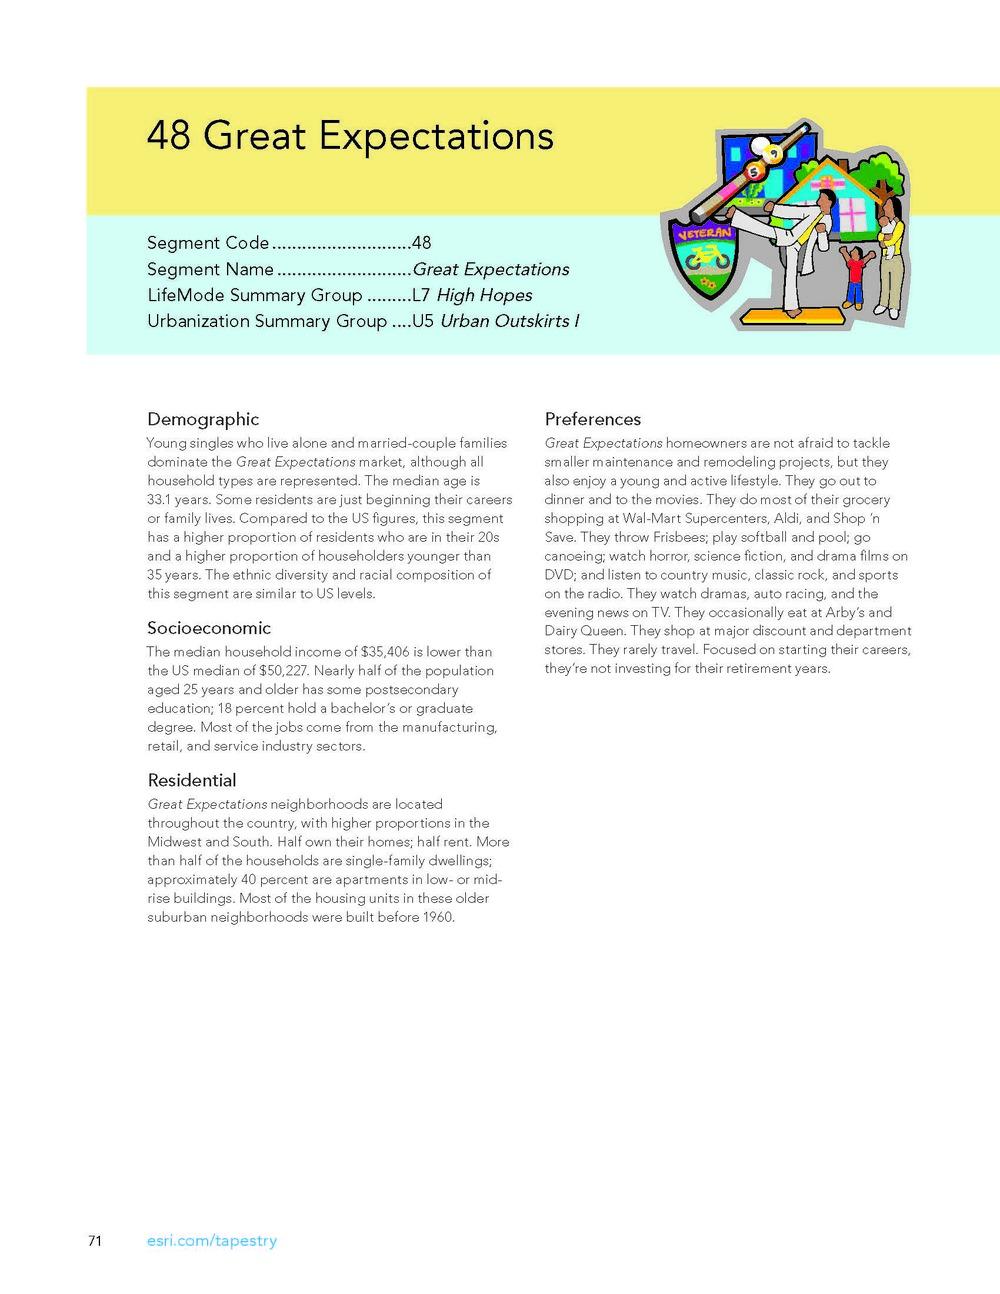 tapestry-segmentation_Page_74.jpg